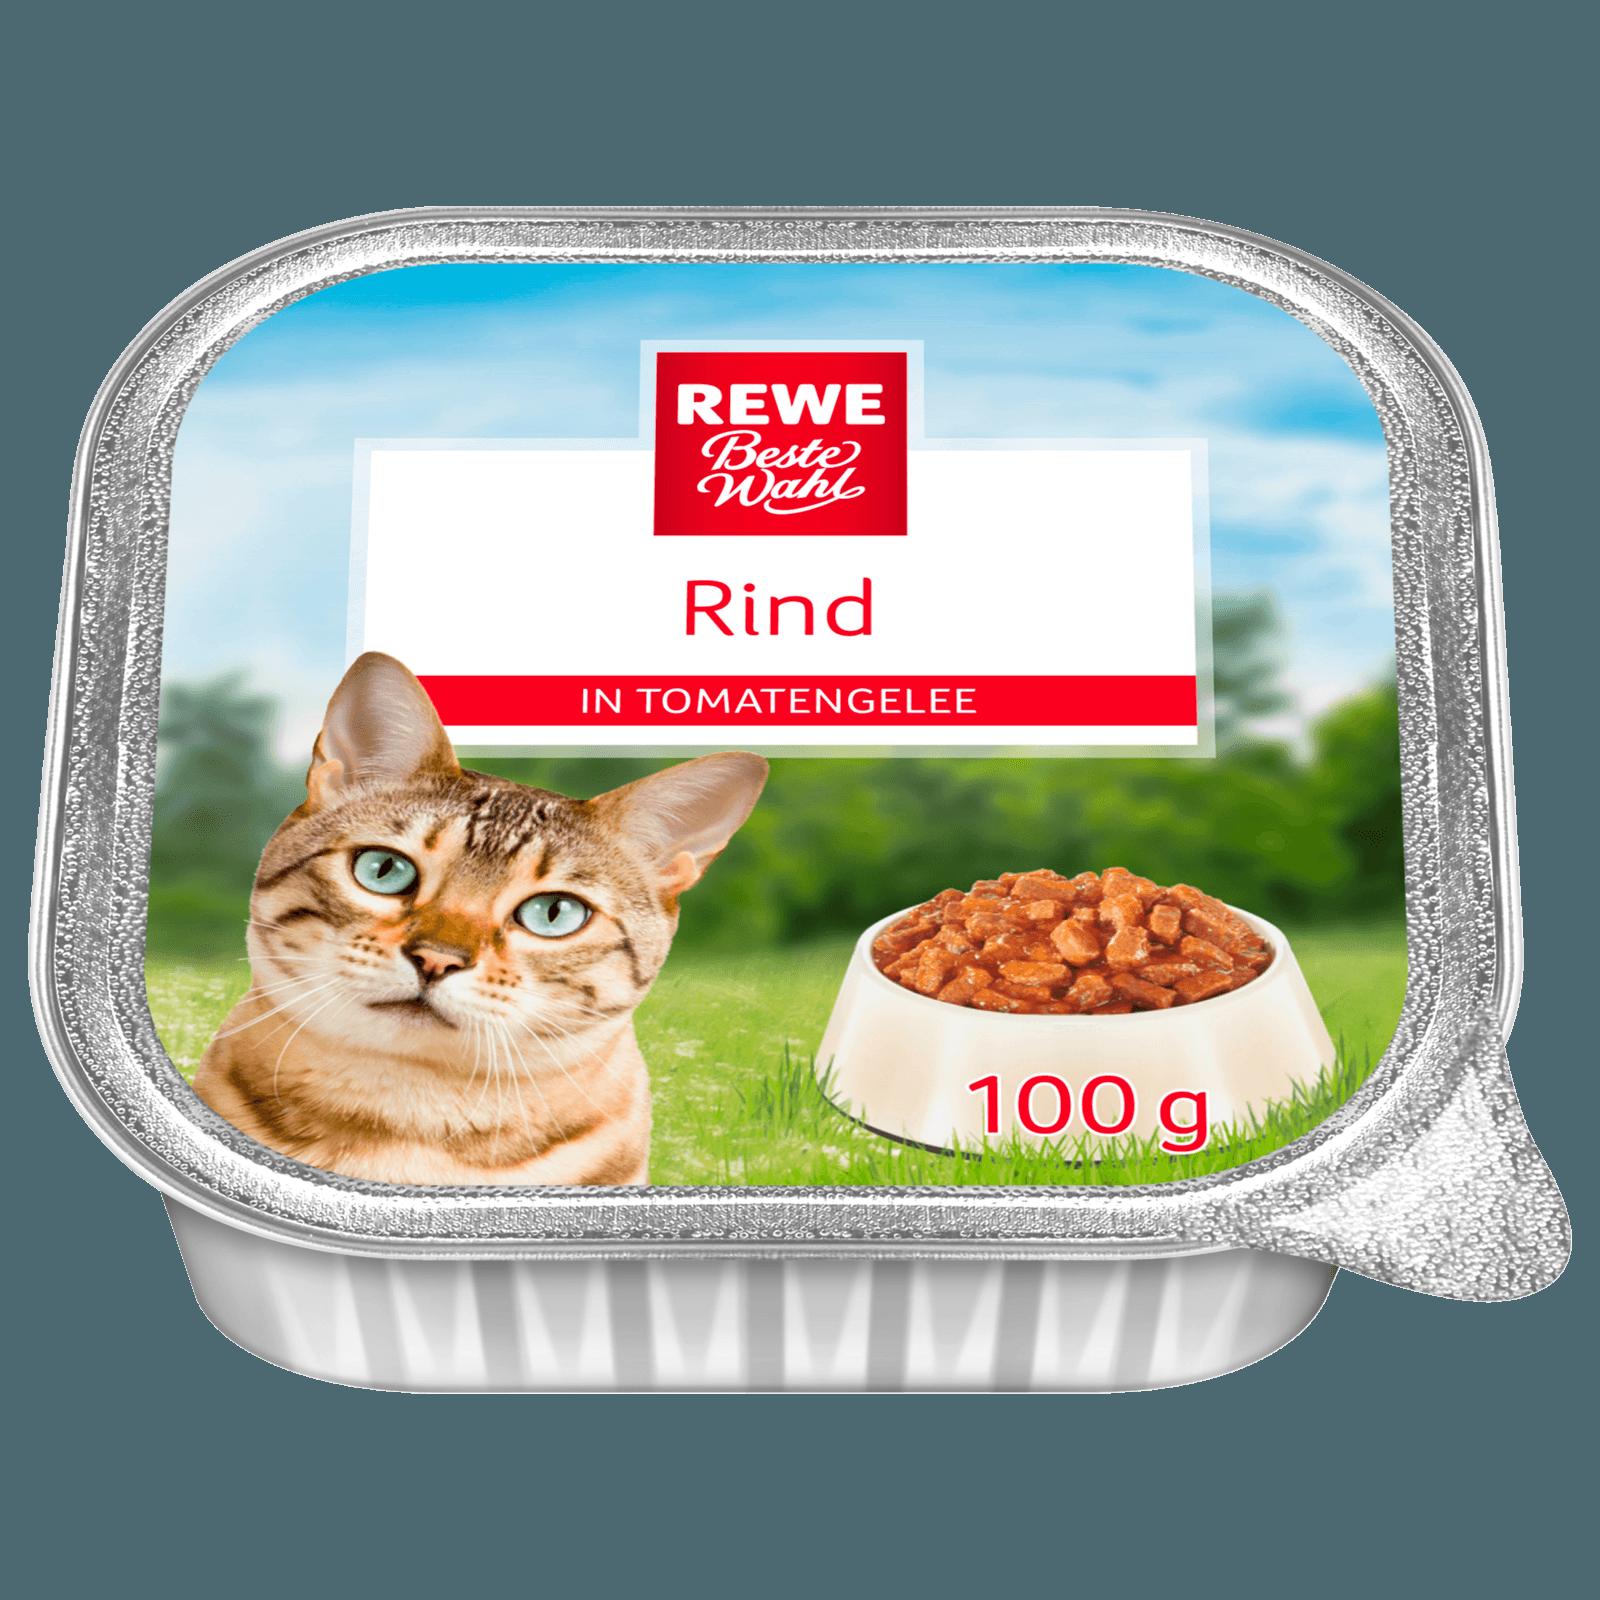 REWE Beste Wahl Katzenfutter Rind in Tomatengelee 100g